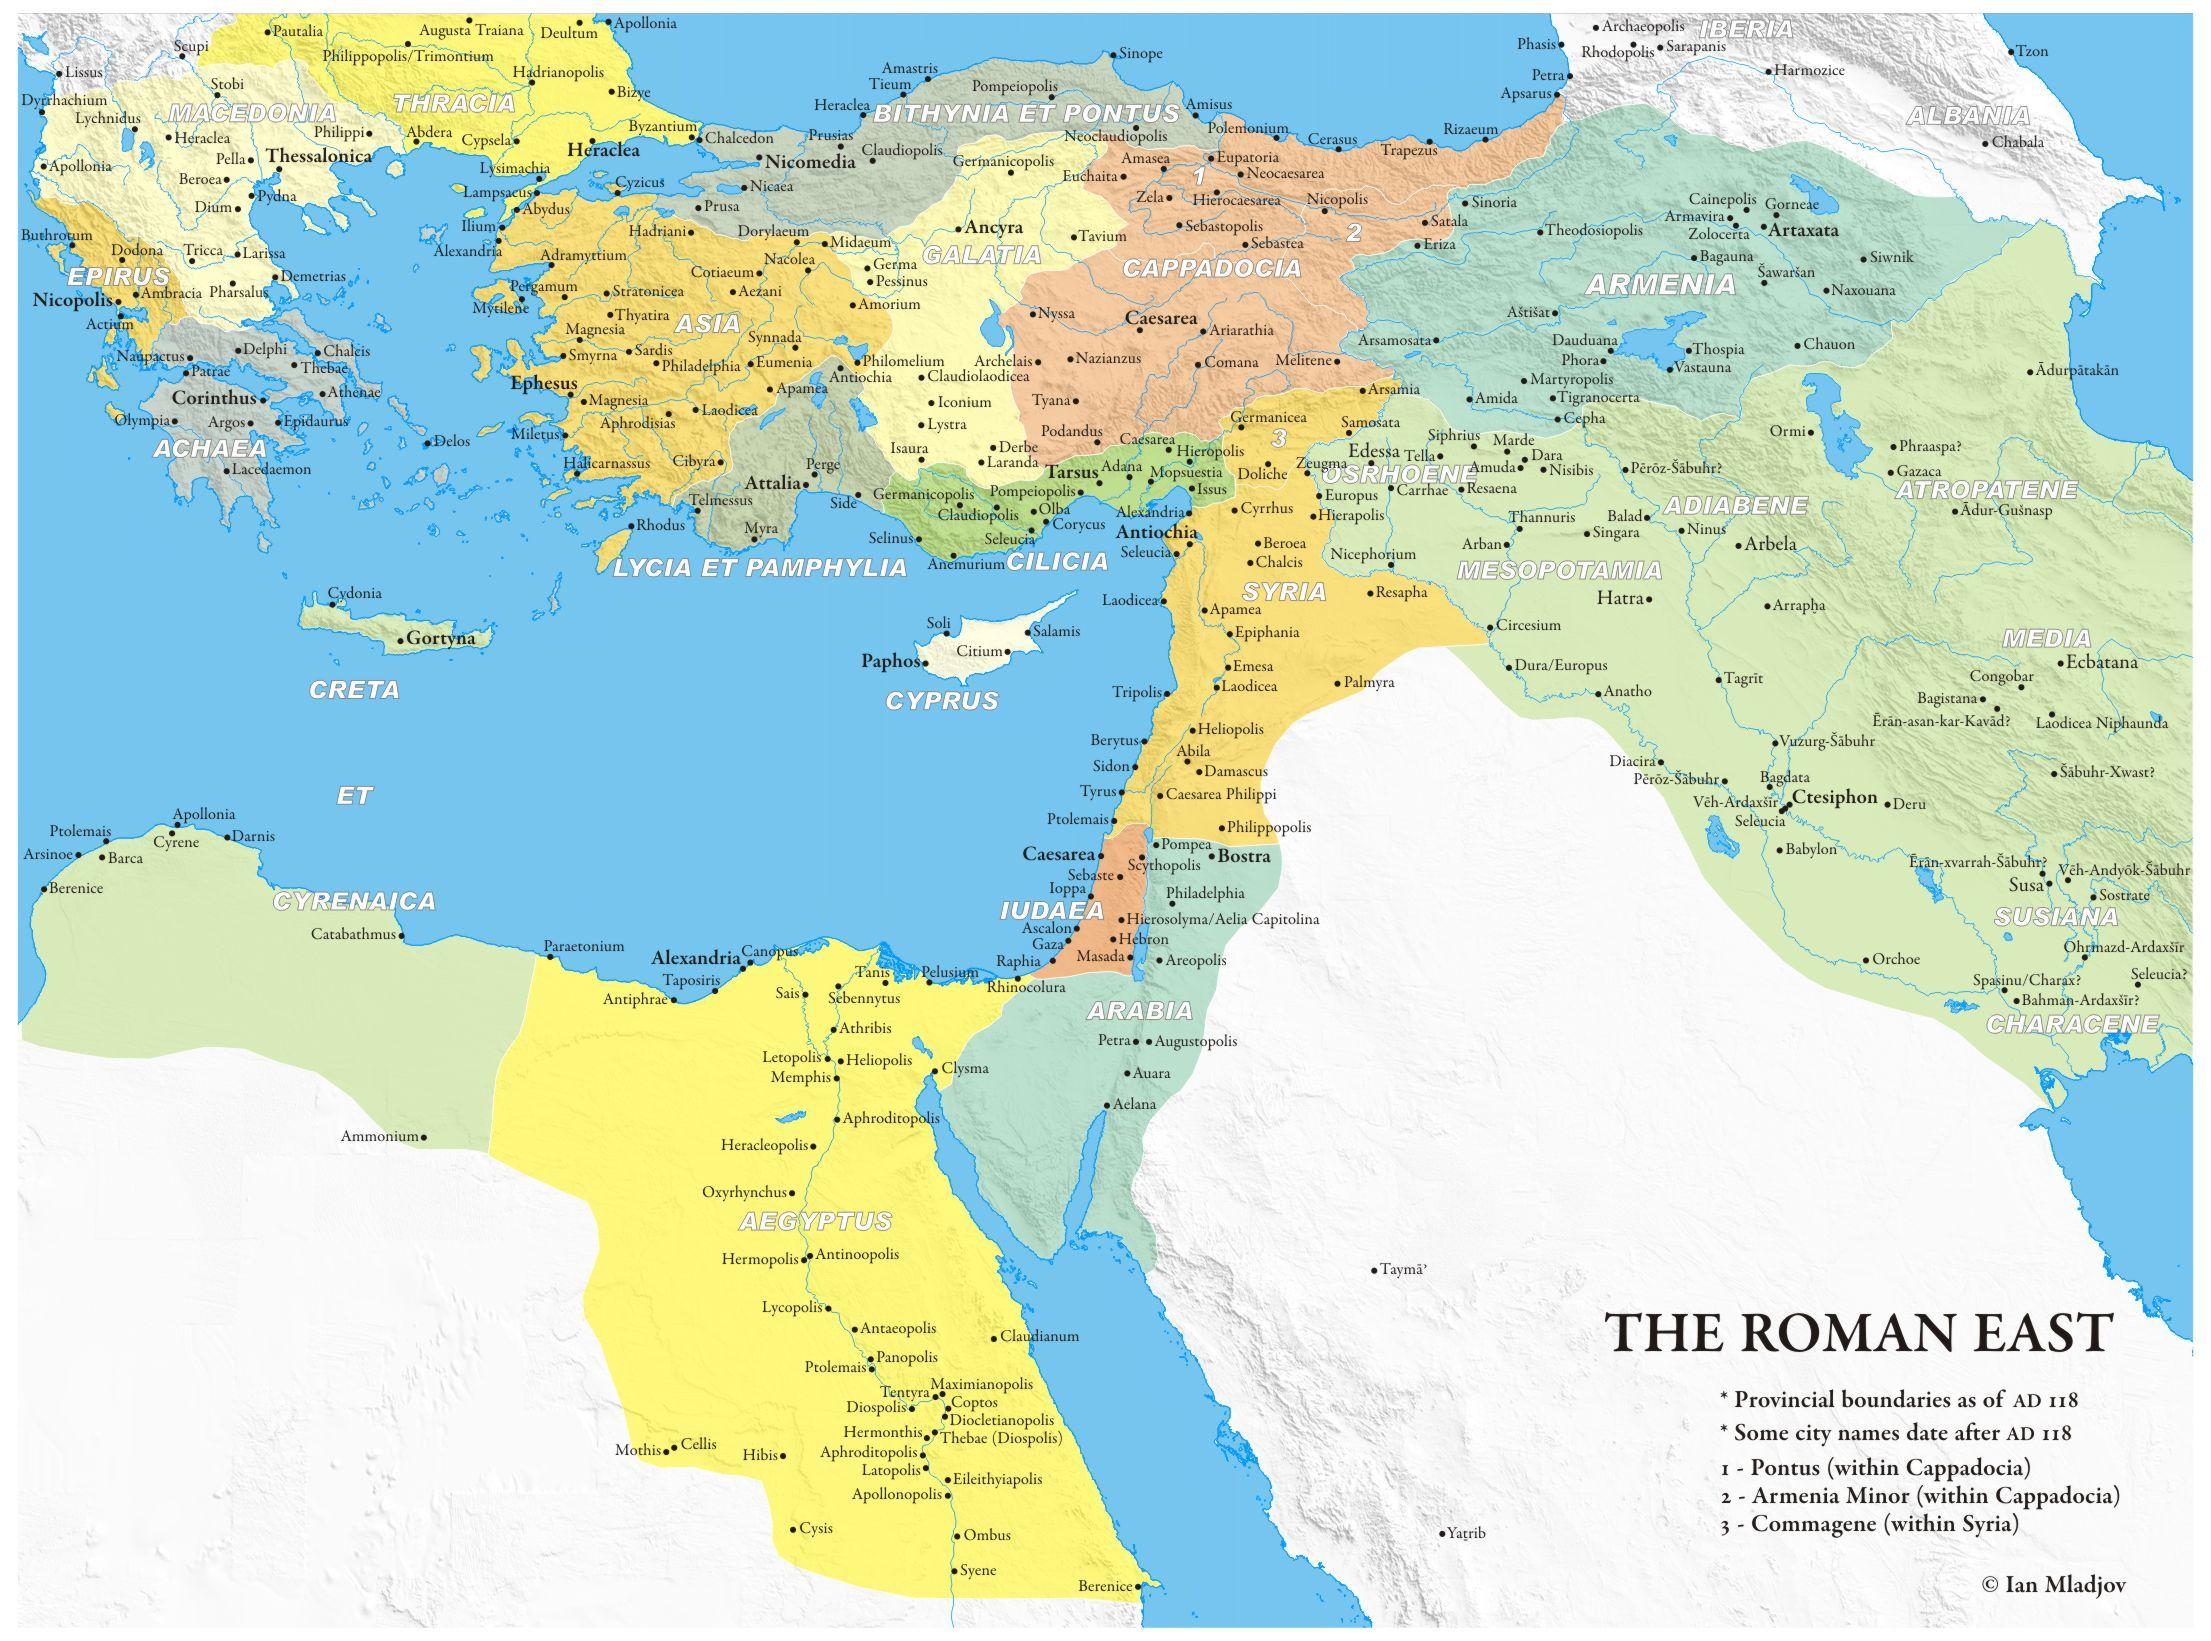 118 CE Eastern Provinces of the Roman Empire